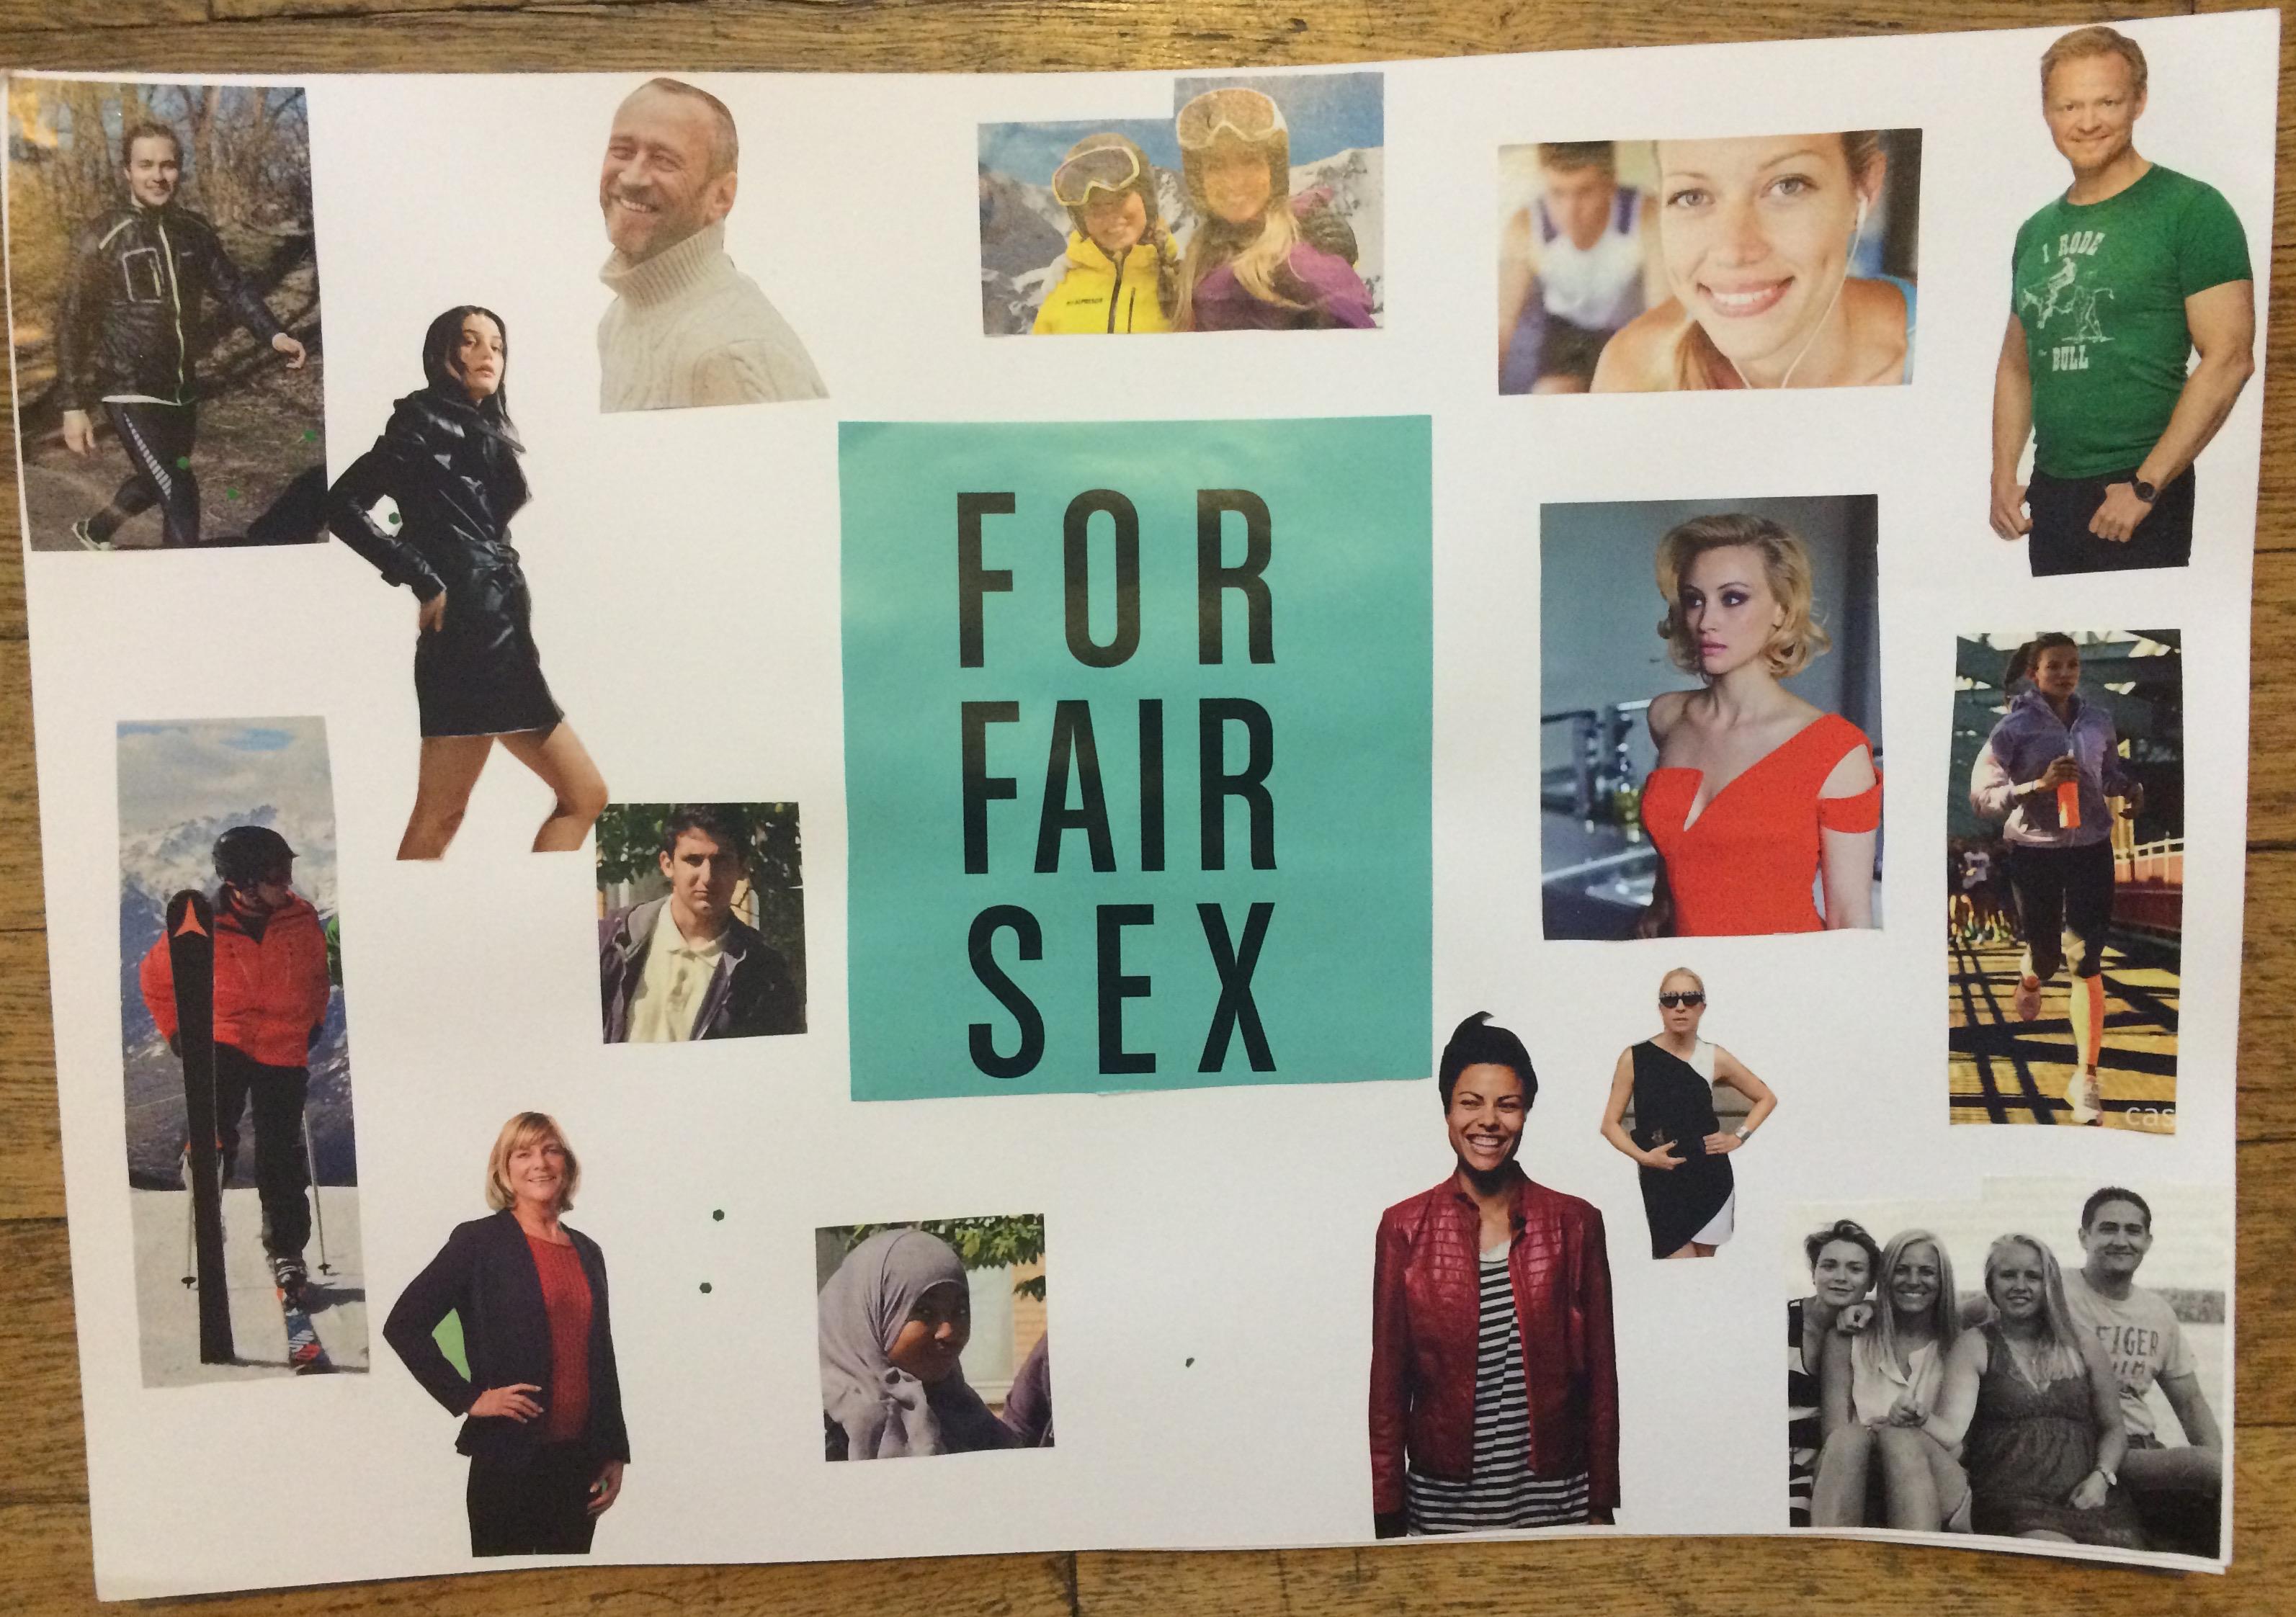 FOR FAIR SEX